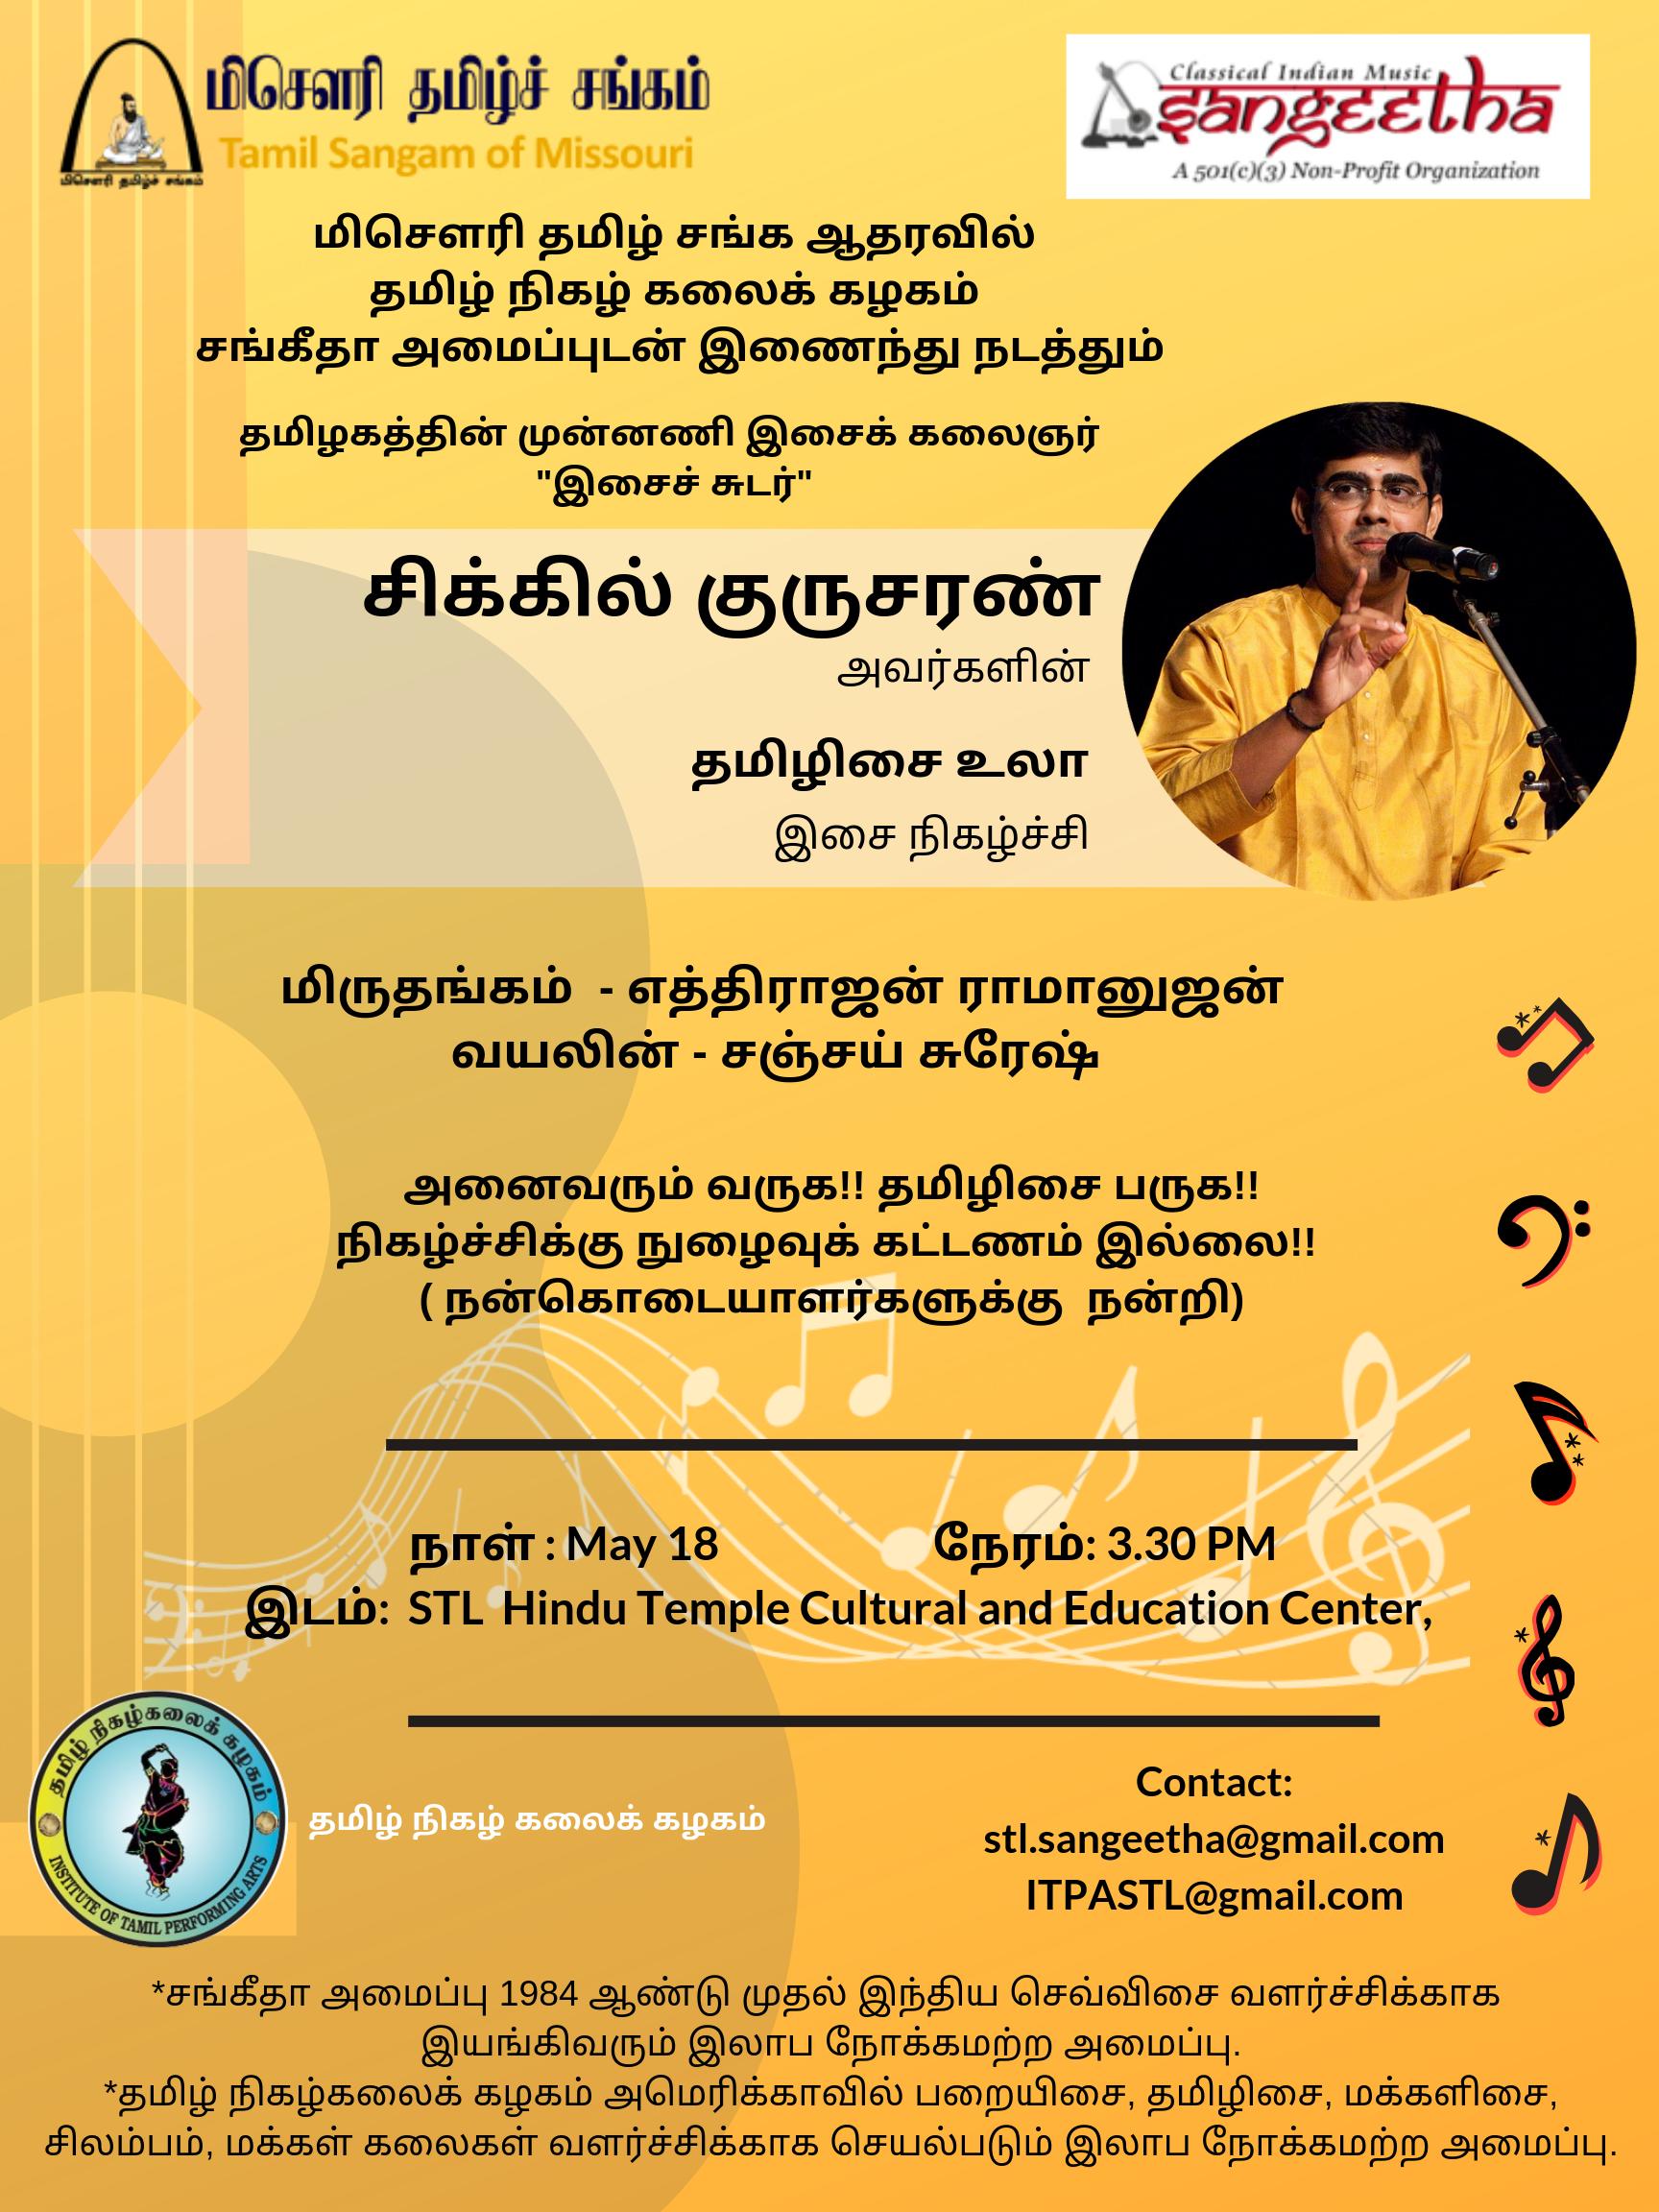 Tamil Sangam of Missouri - Upcoming events